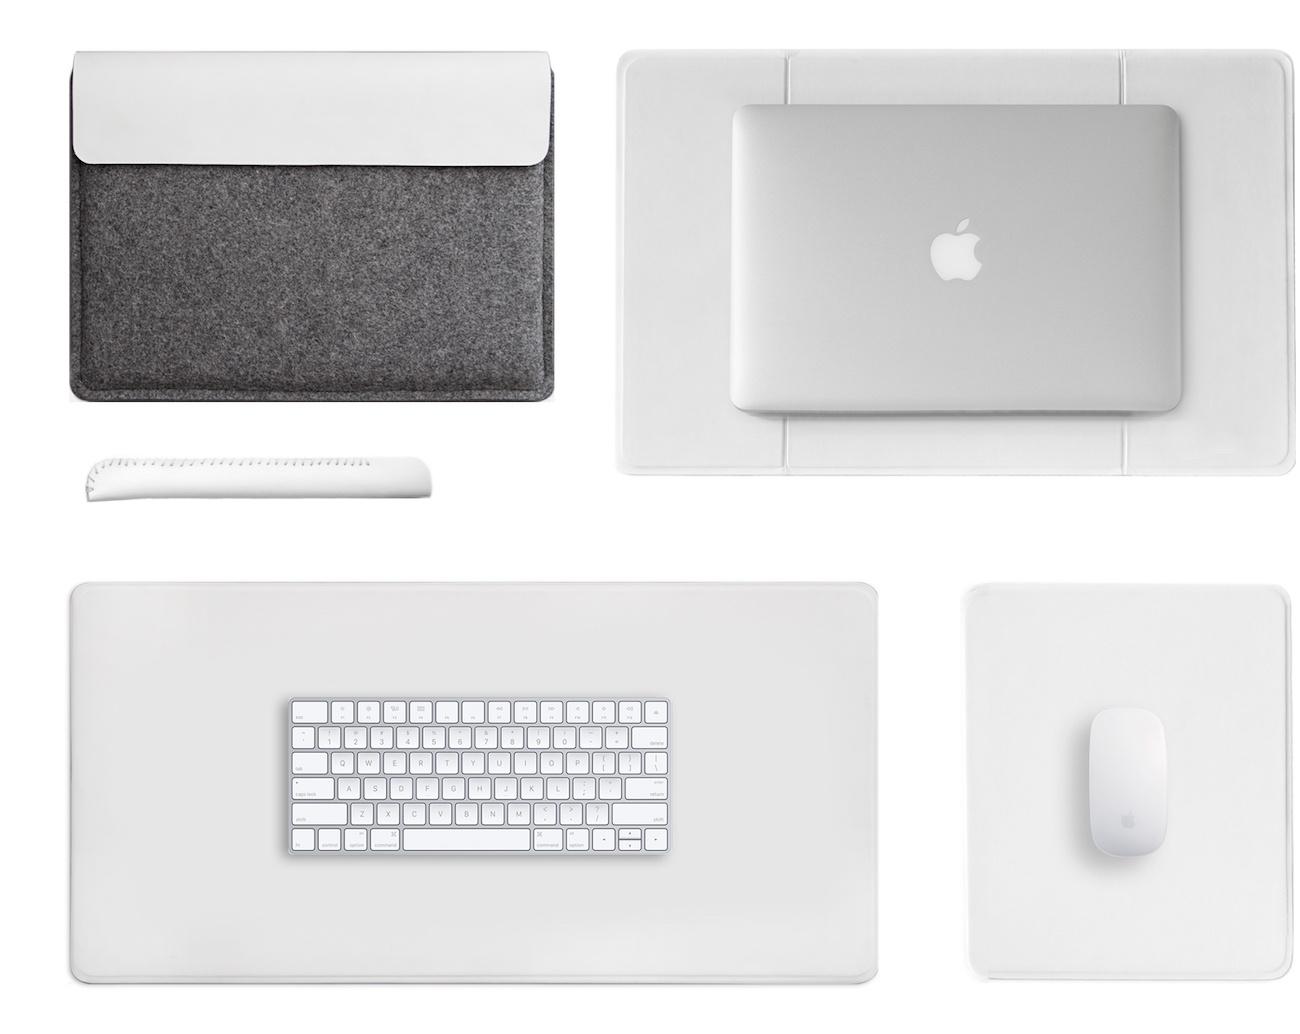 Accessory For Mac